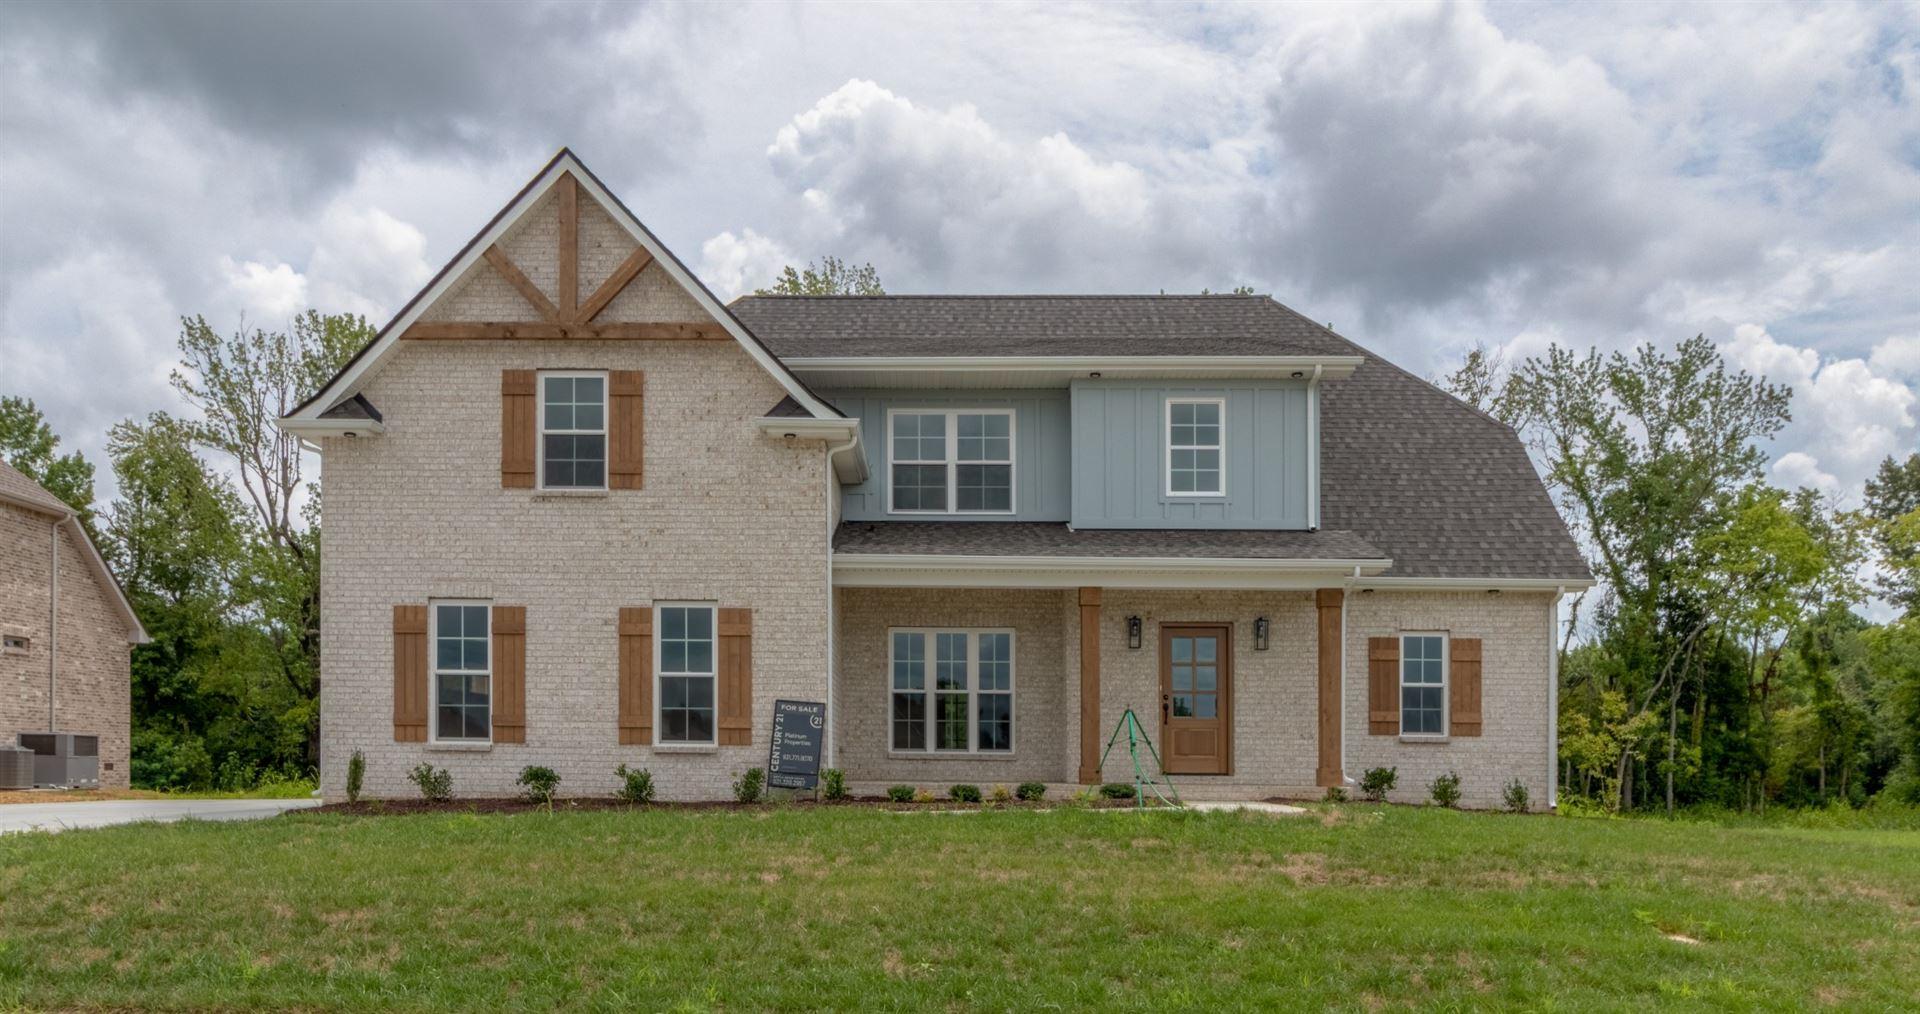 109 Denton Court, Clarksville, TN 37043 - MLS#: 2257774